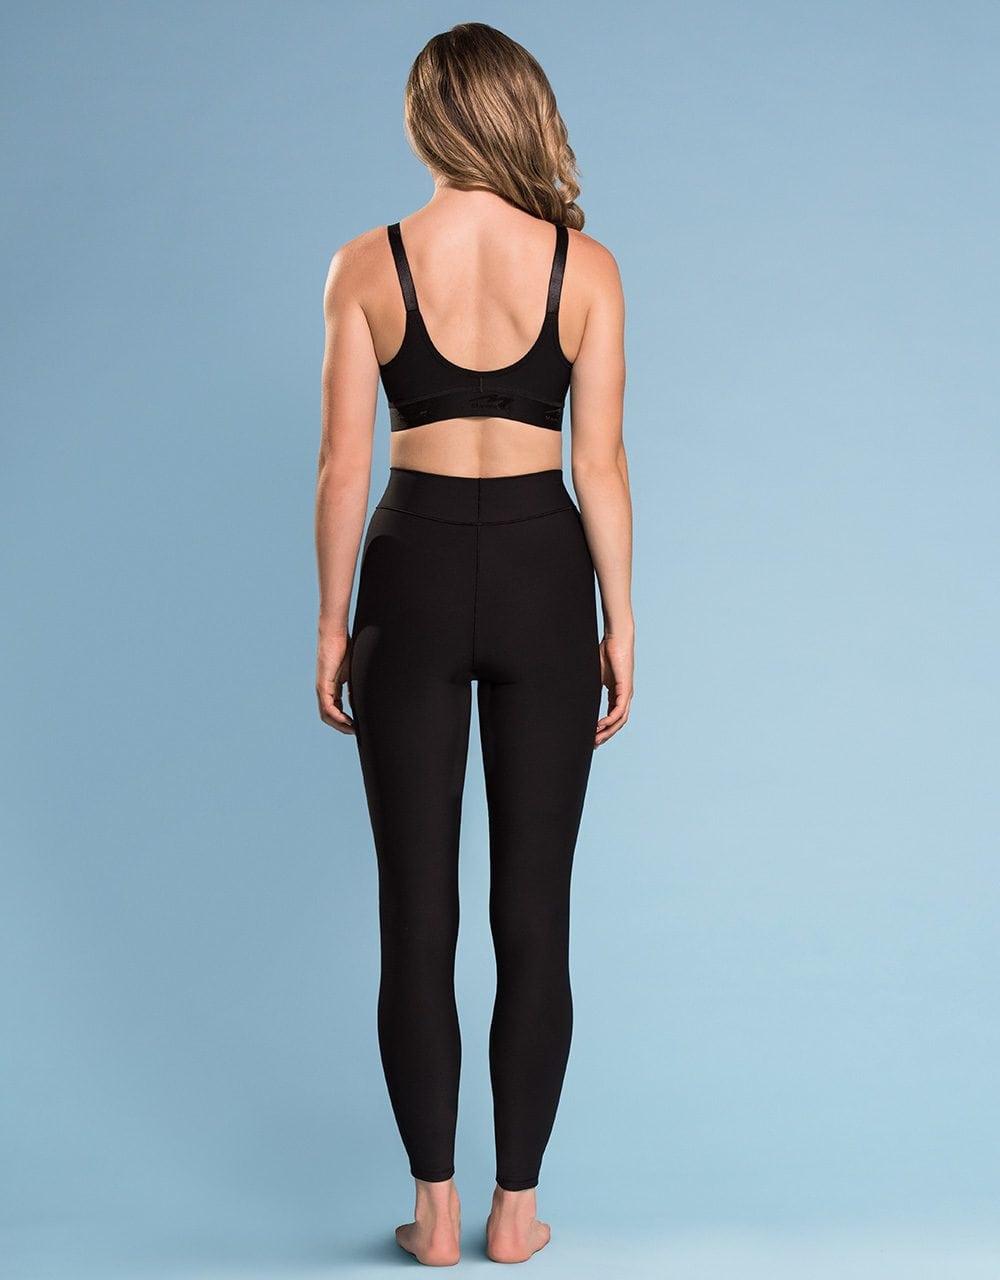 Marena Women's Active Leggings - Medical Compression Garments Australia